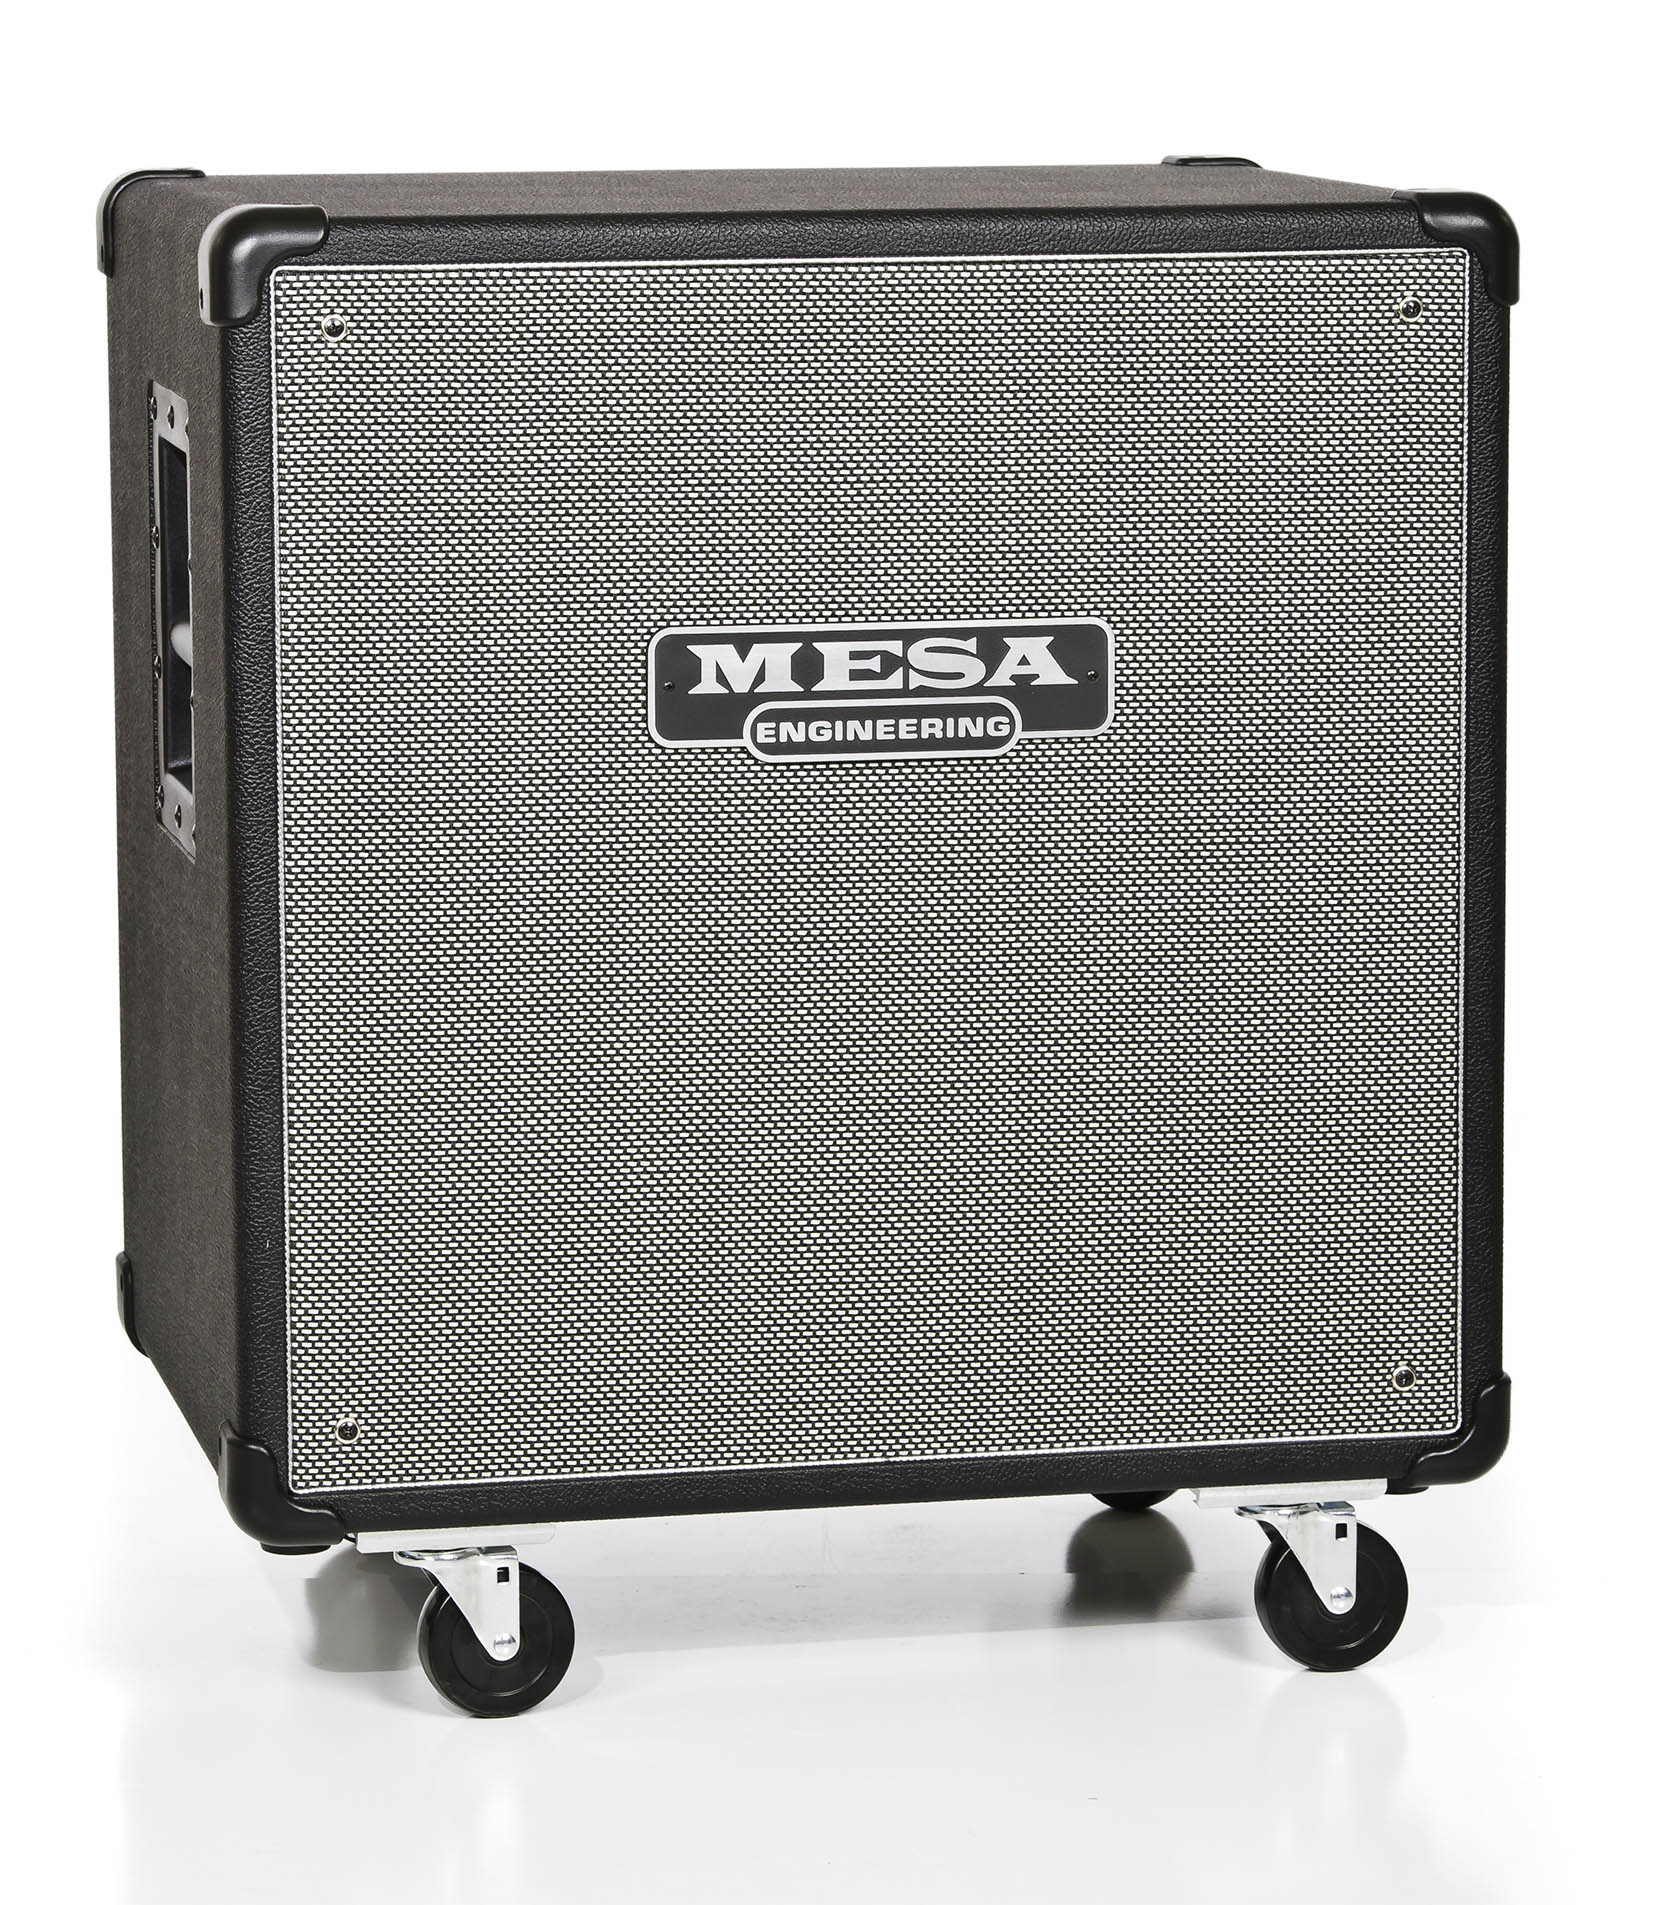 Mesaboogie - 4x10 Traditional PowerHouse Bass Cabinet - info@melodyhousemi.com